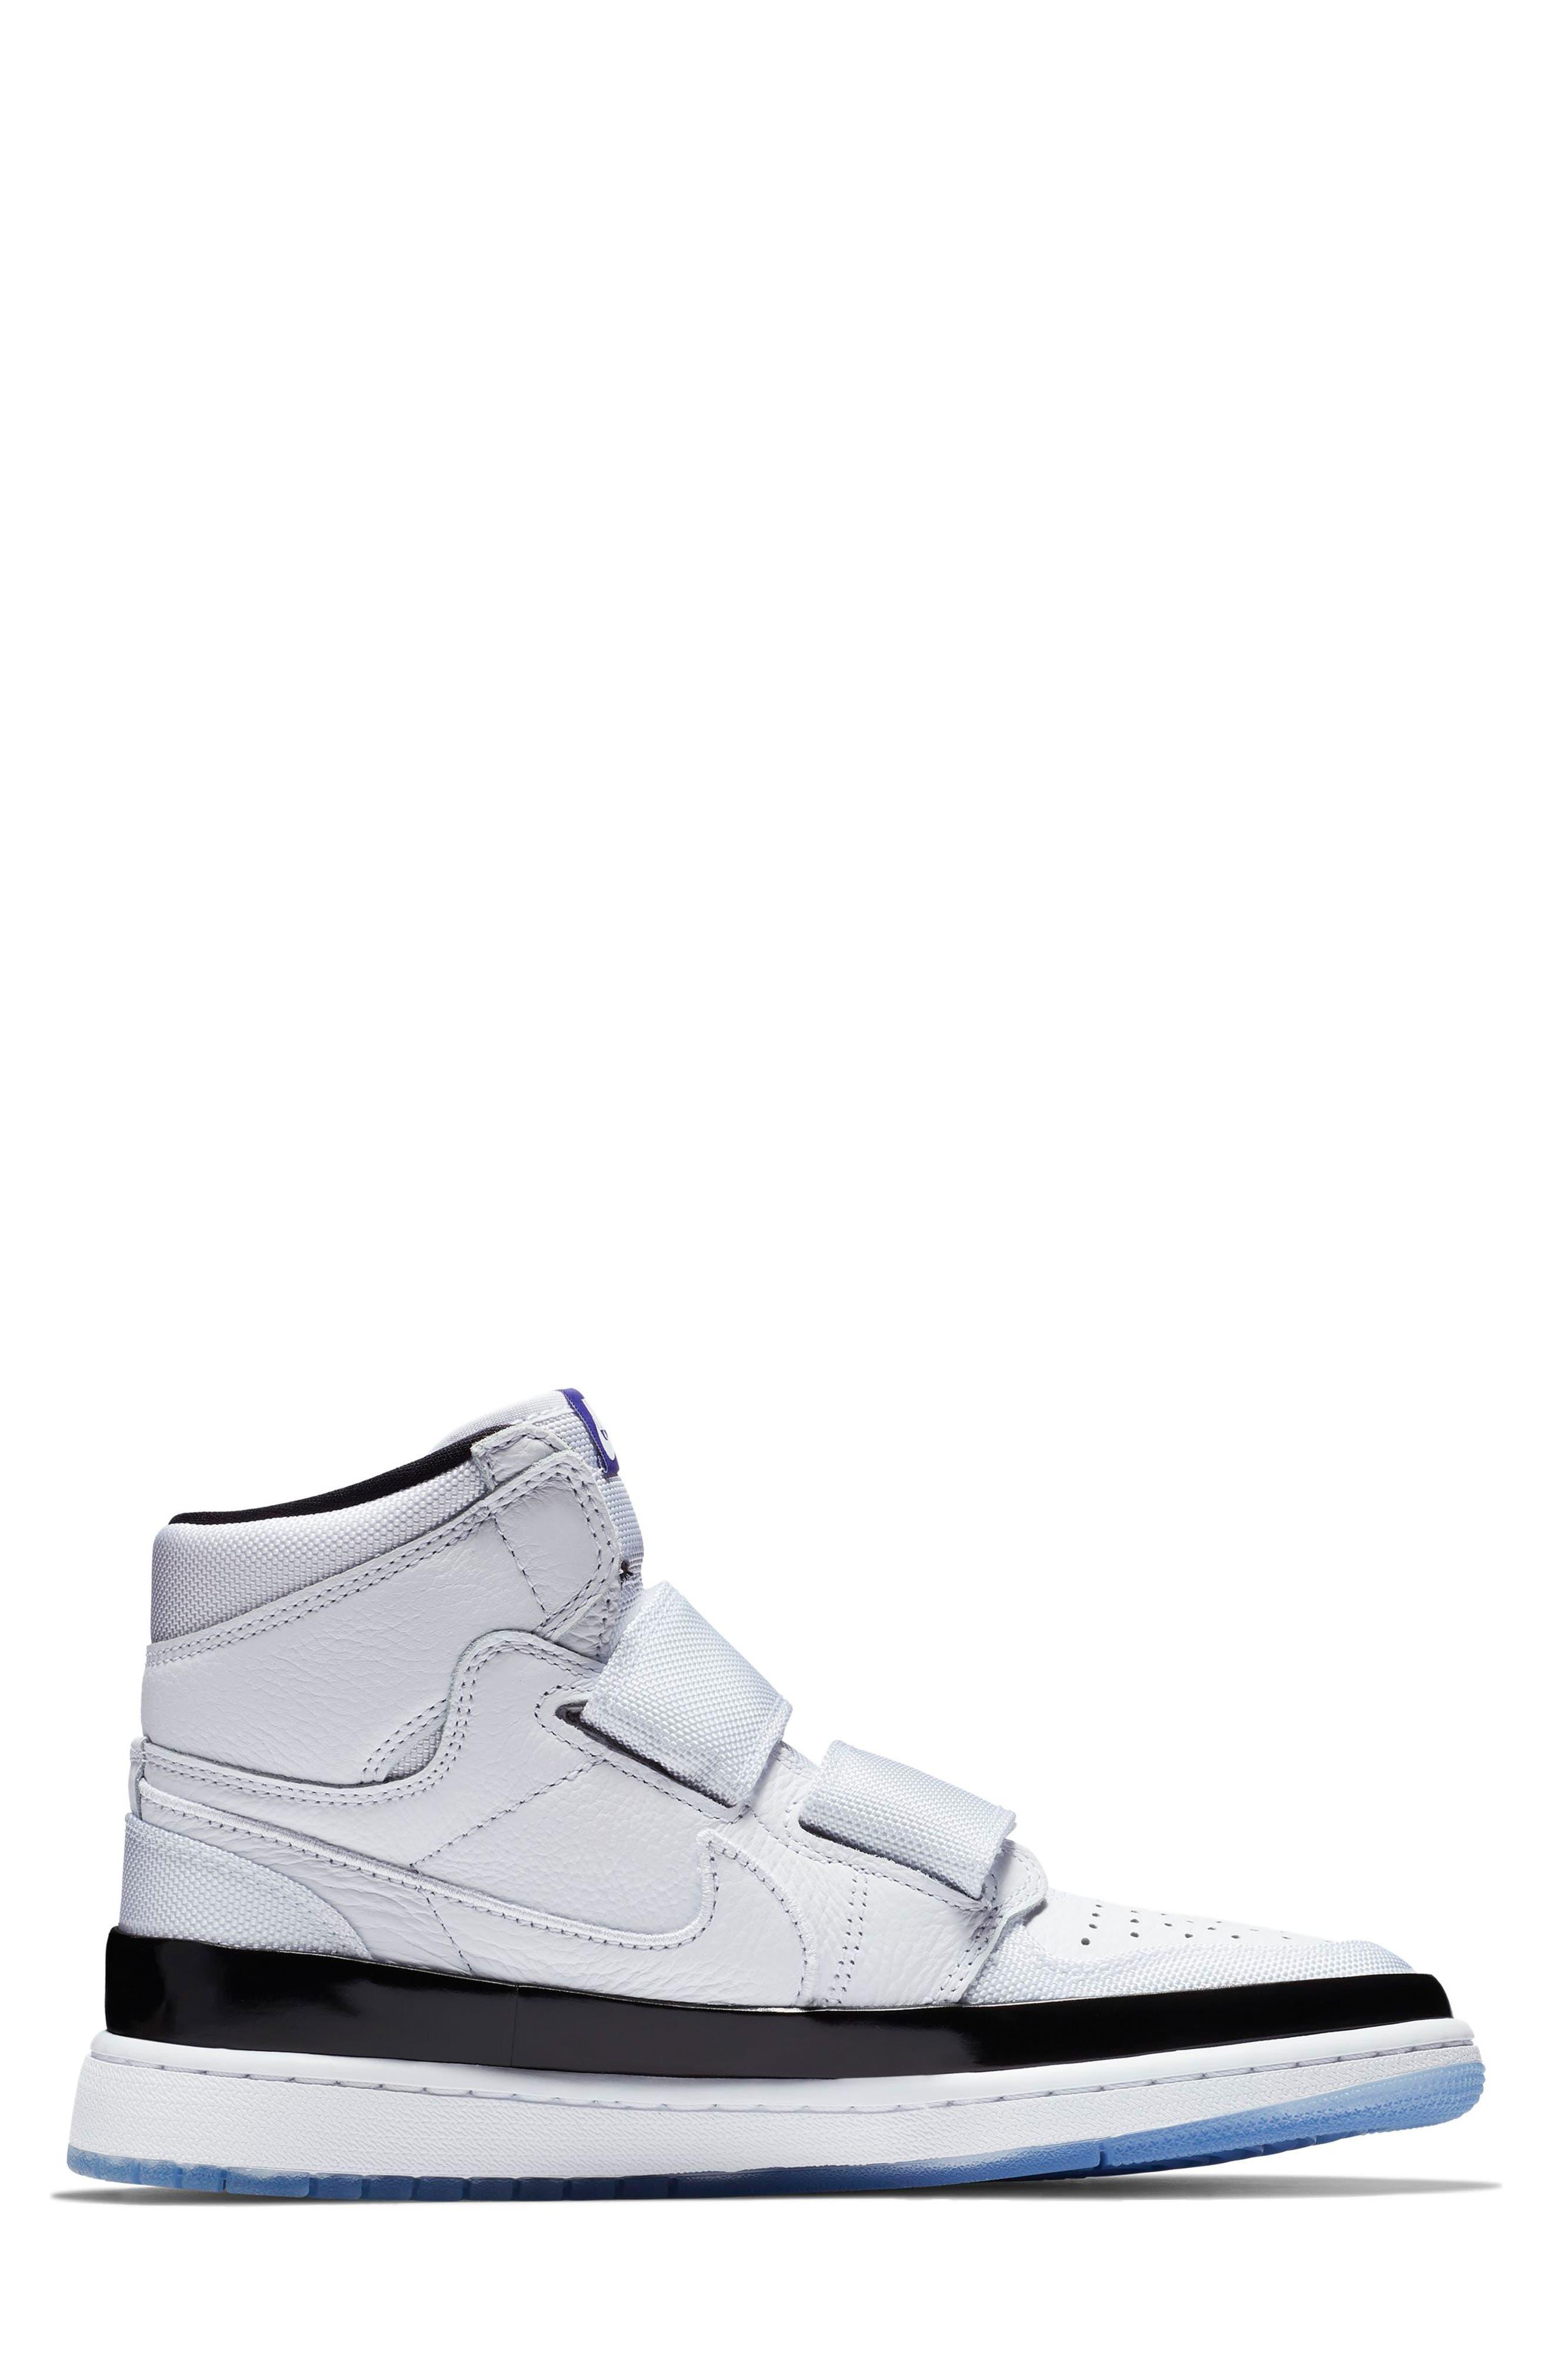 Air Jordan 1 Retro High Double Strap Sneaker,                             Alternate thumbnail 2, color,                             WHITE/ DARK CONCORD/ BLACK